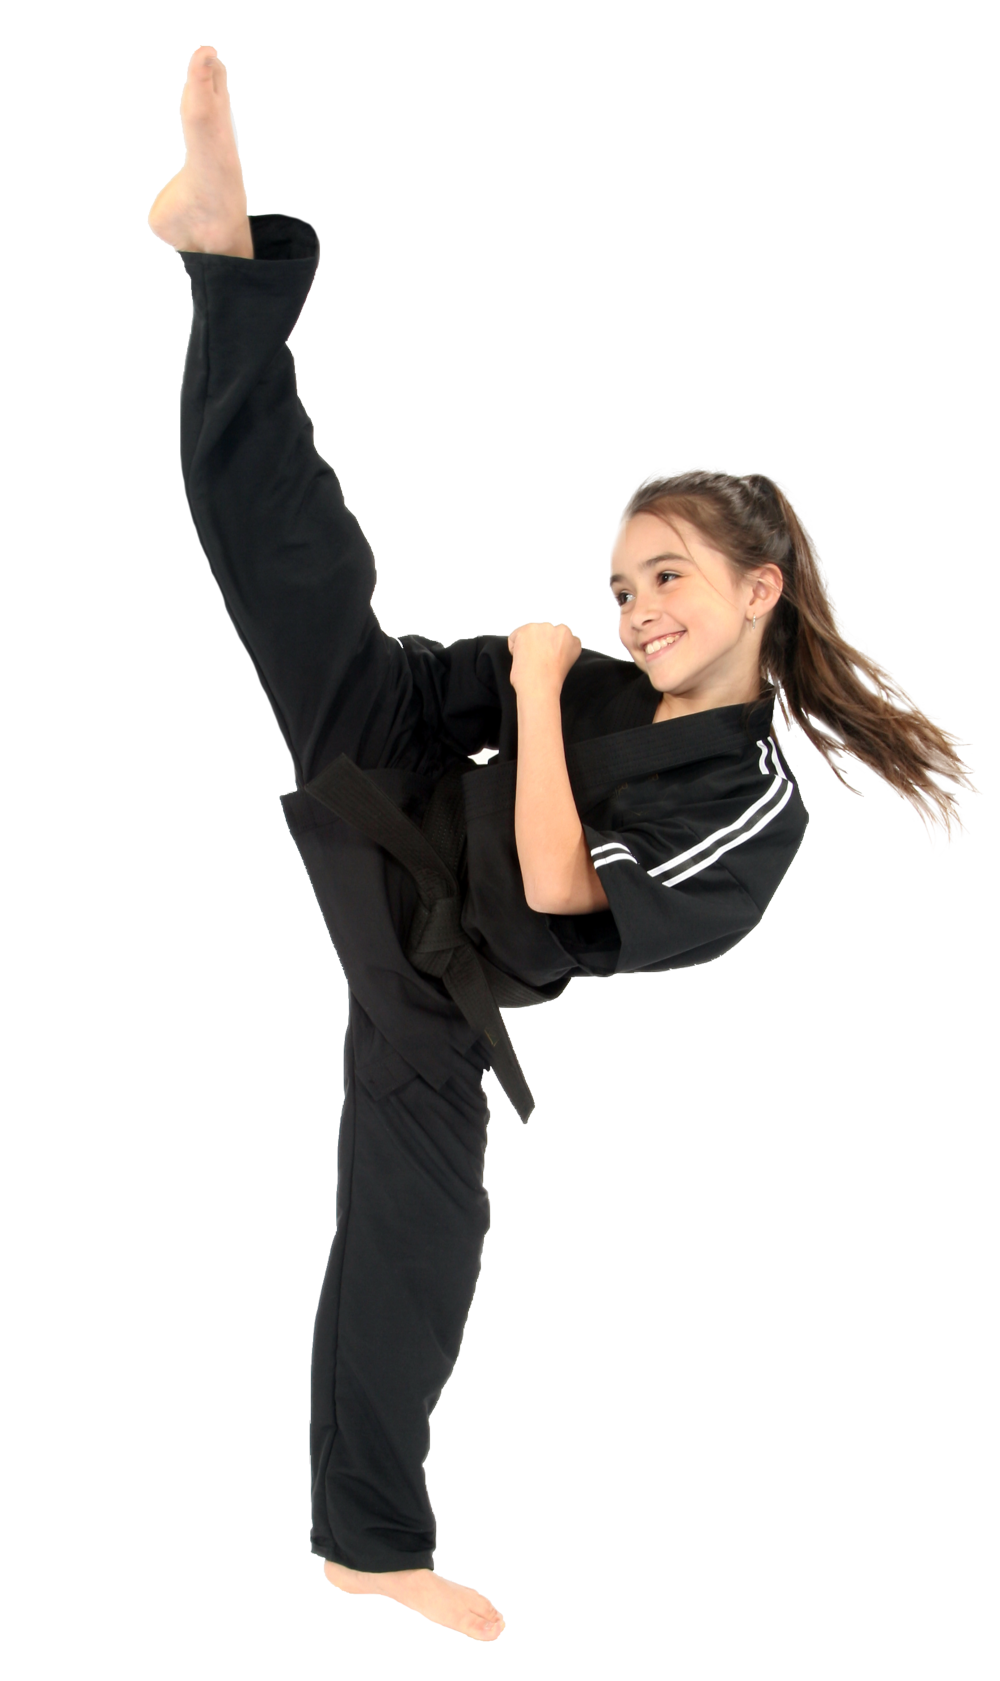 Karate School For Kids Dickinson Nd